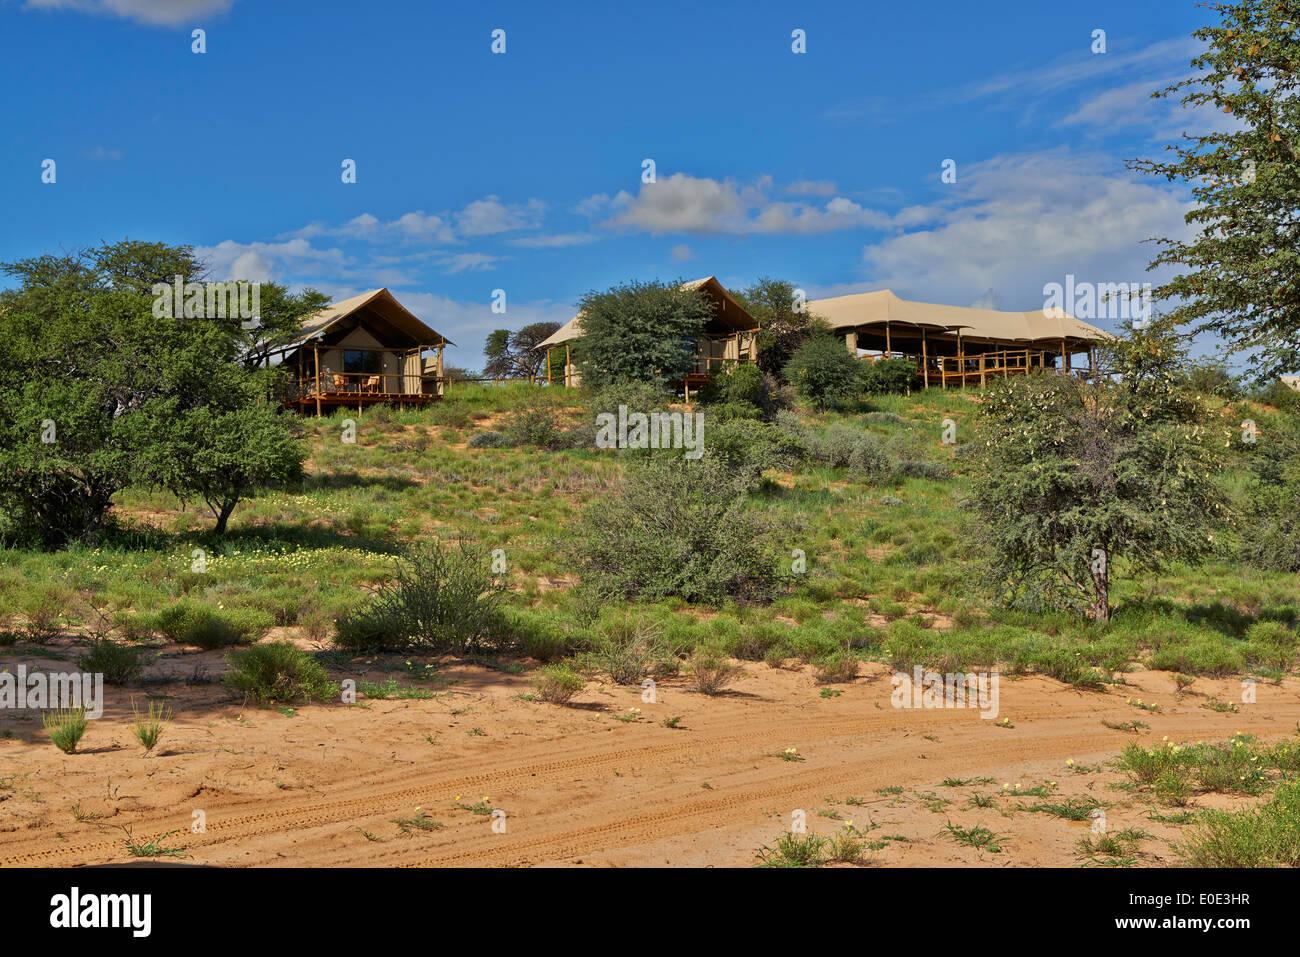 Polentswa Tented Camp, Kgalagadi Transfrontier Park, Kalahari, Afrique du Sud, Botswana, Africa Photo Stock